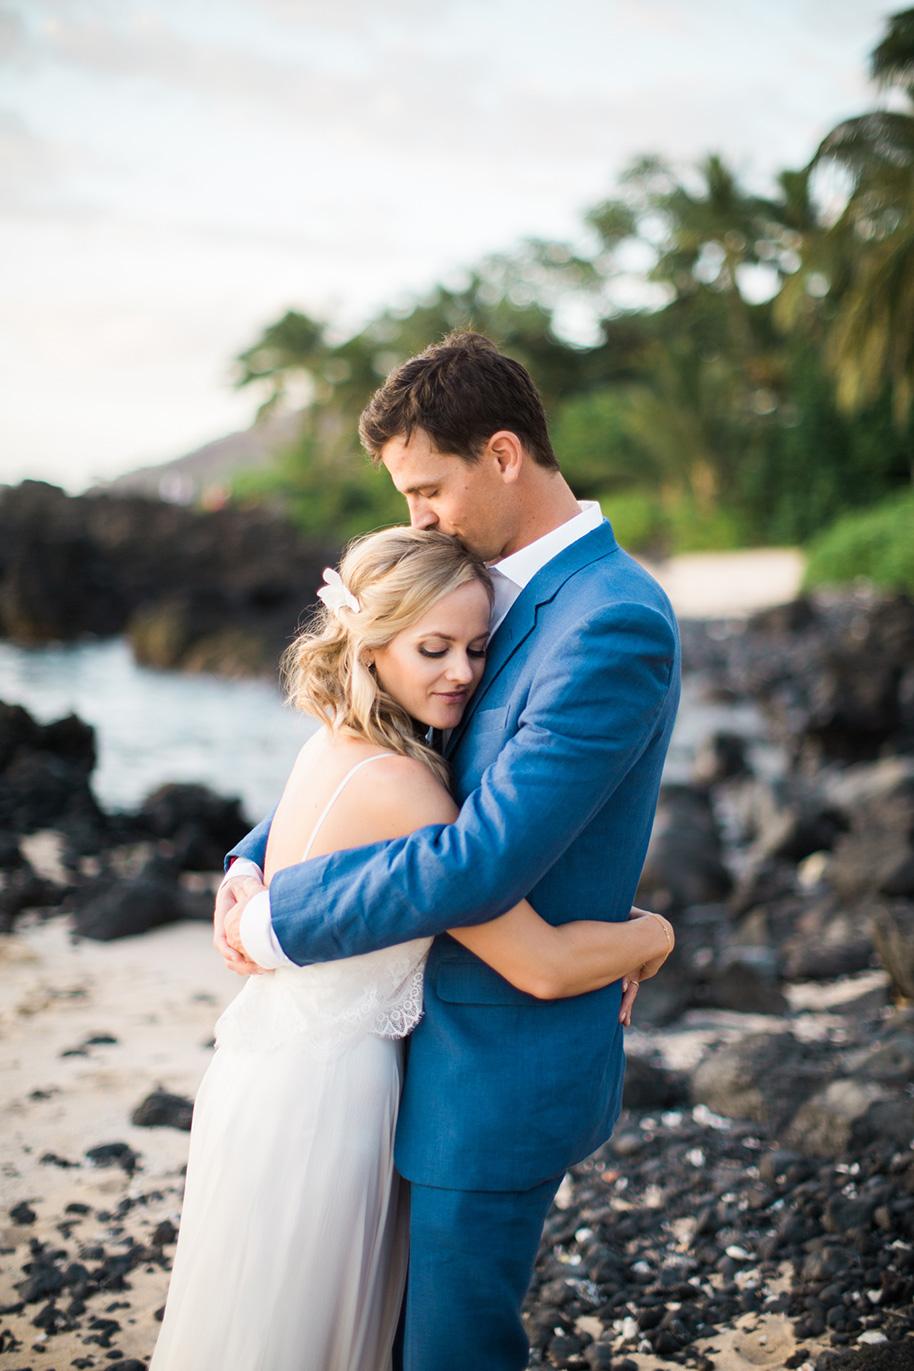 Maui-Wedding-060216-24